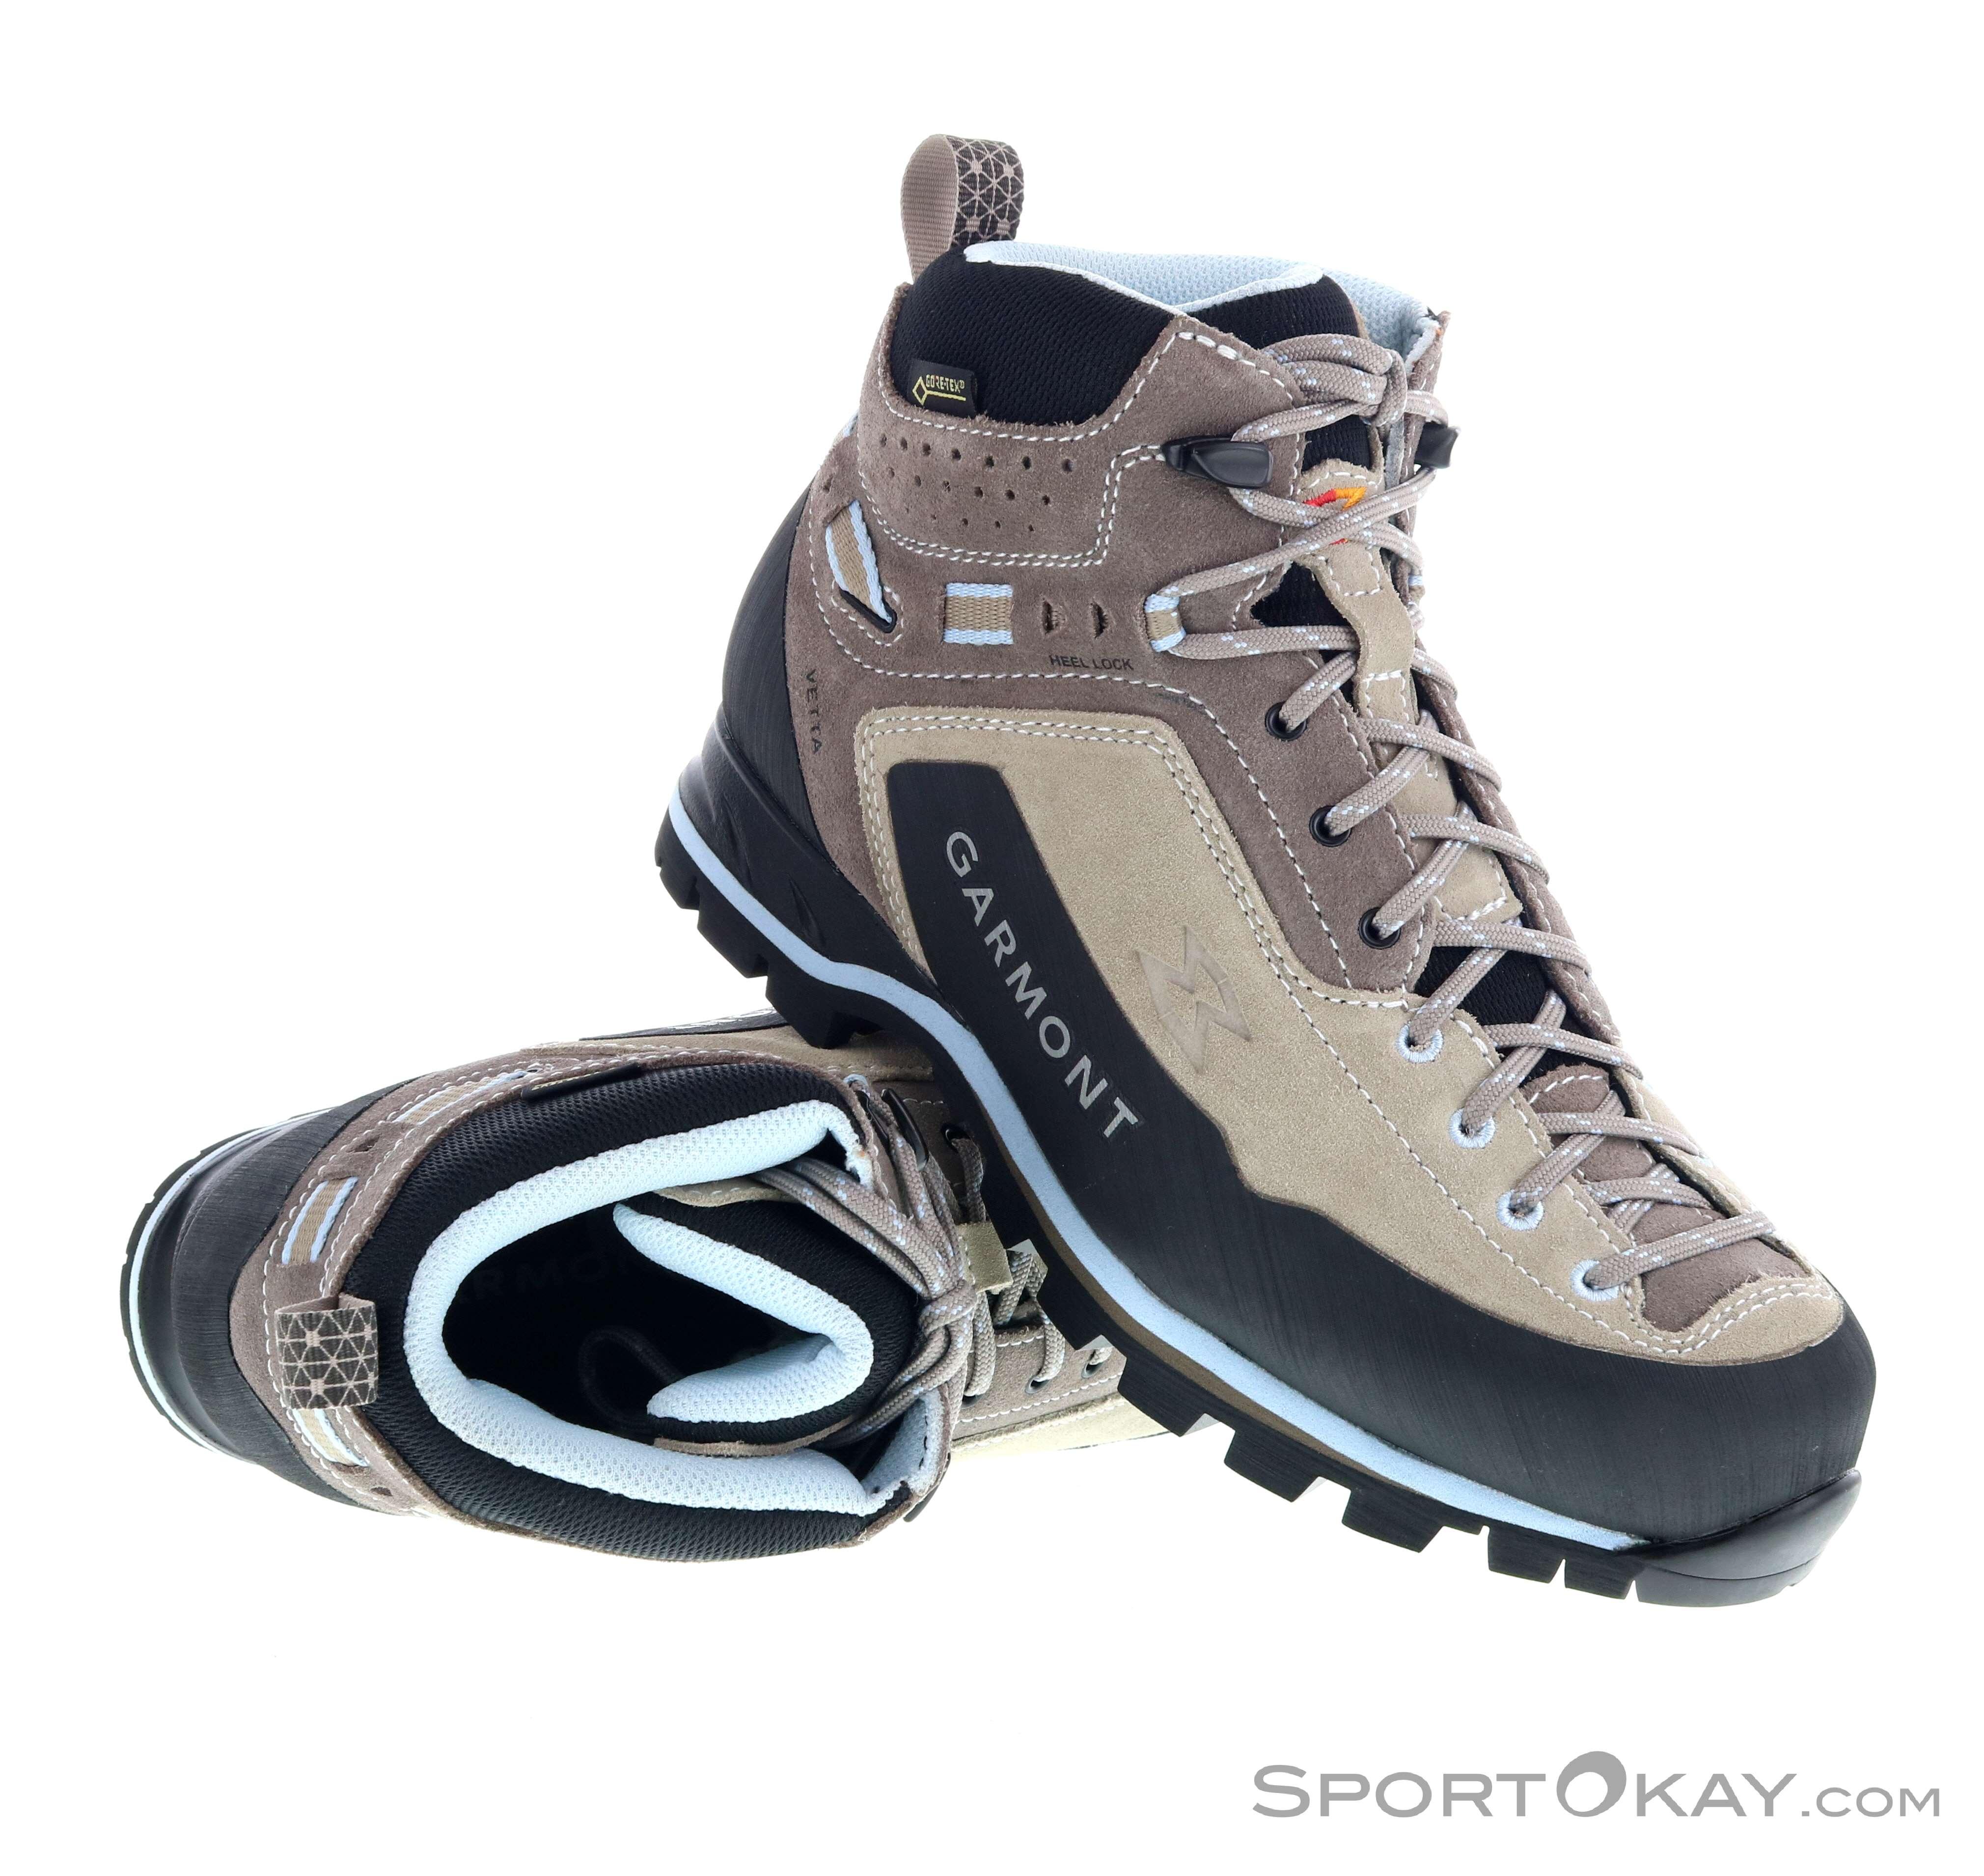 Garmont Vetta GTX Womens Hiking Boots